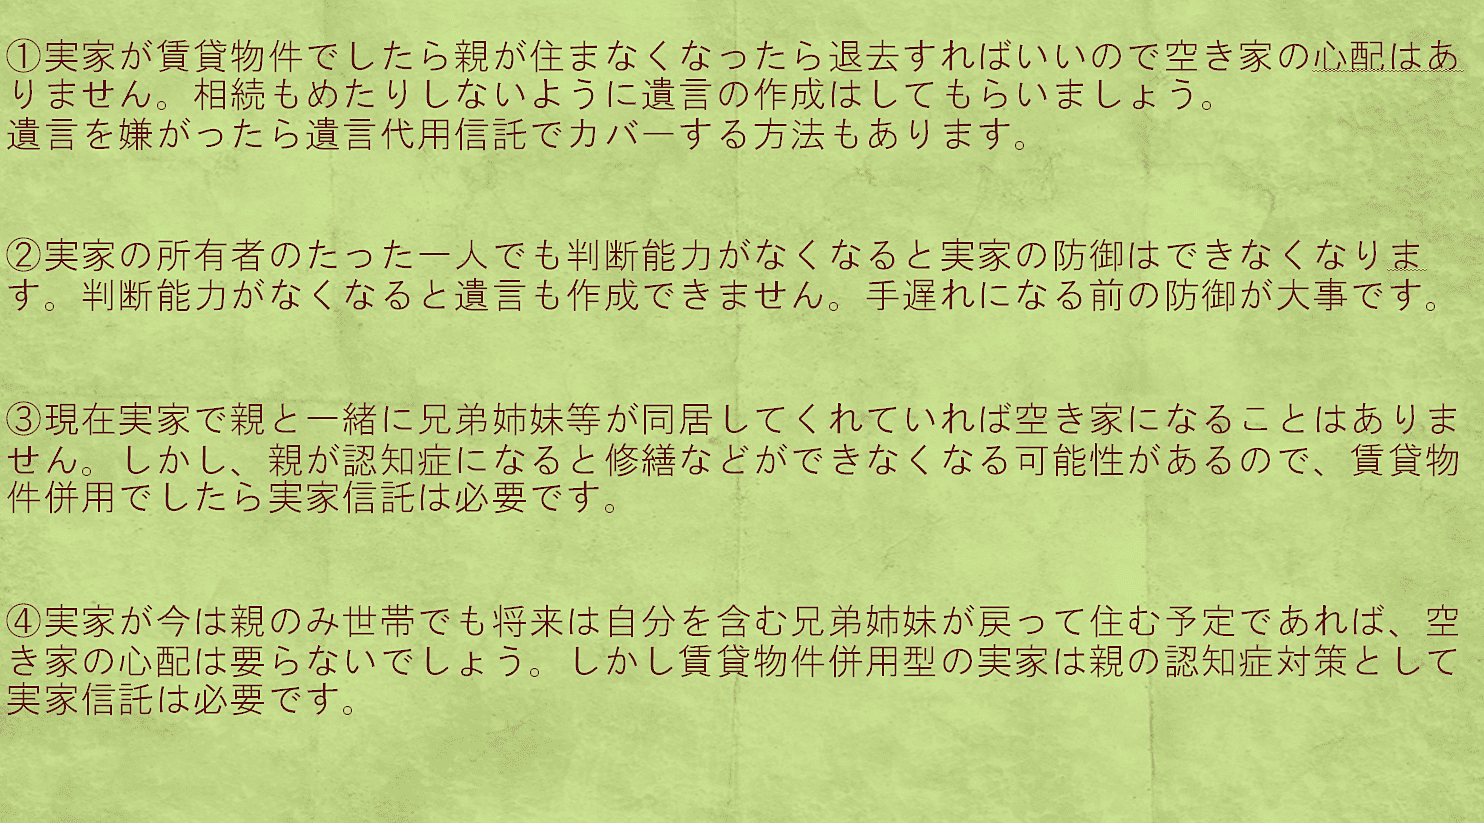 https://lifer.co.jp/files/libs/32/201710031745352791.PNG